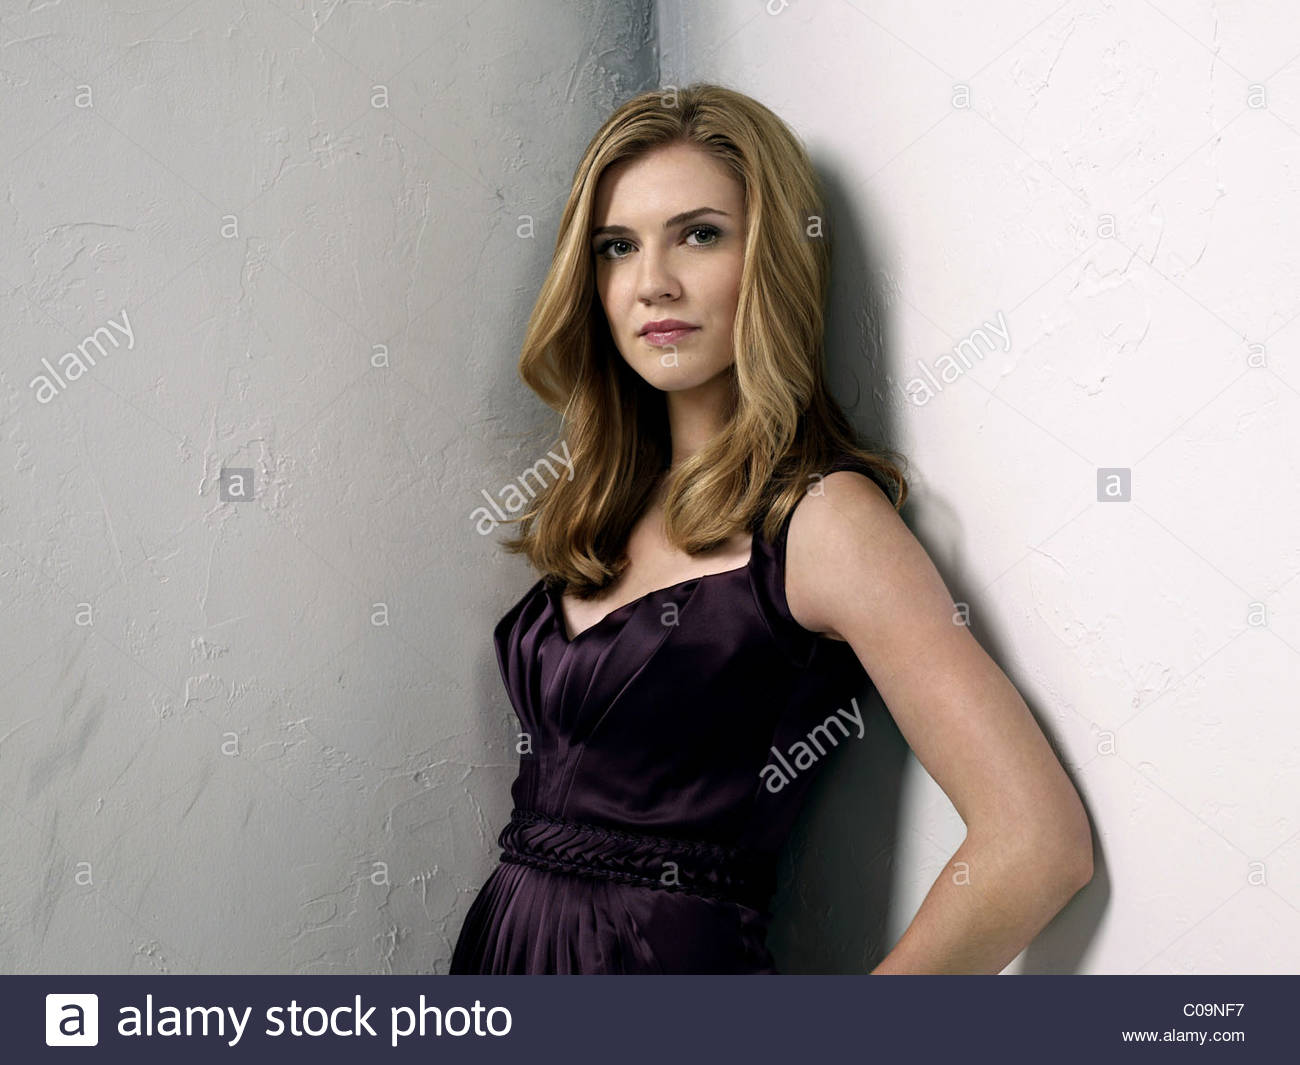 SARA CANNING THE VAMPIRE DIARIES (2009) - Stock Image